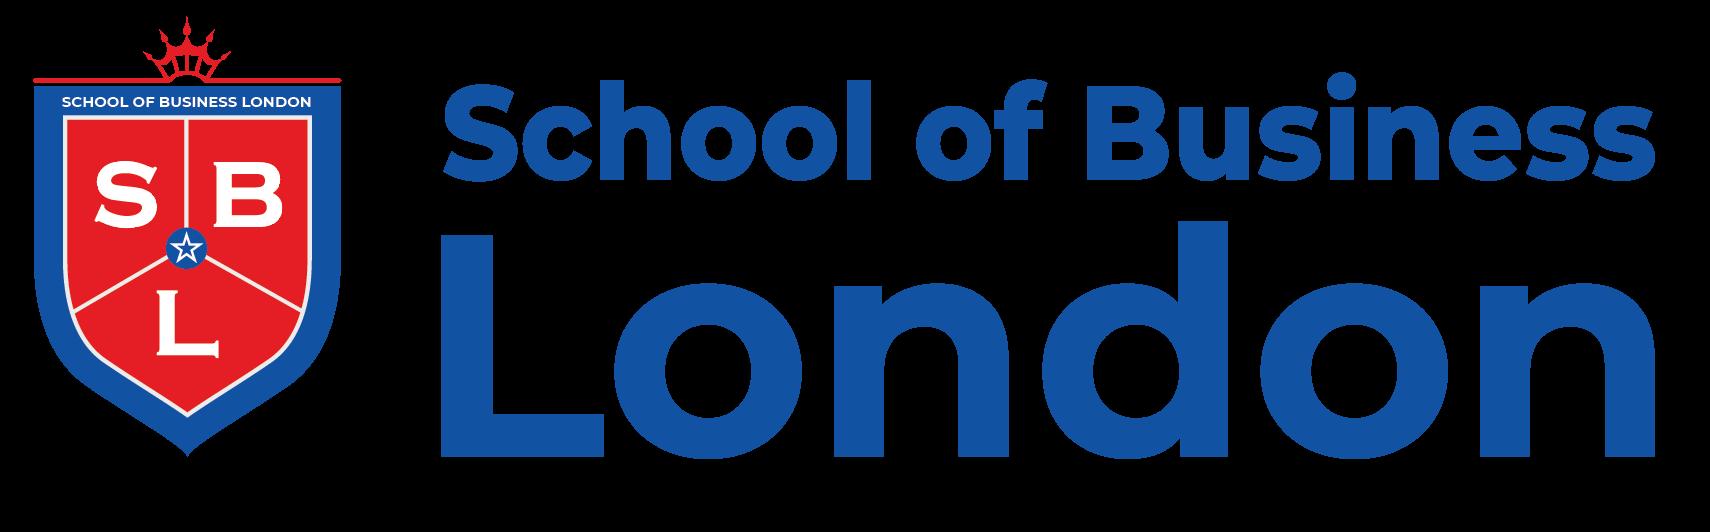 Read School of Business London Reviews